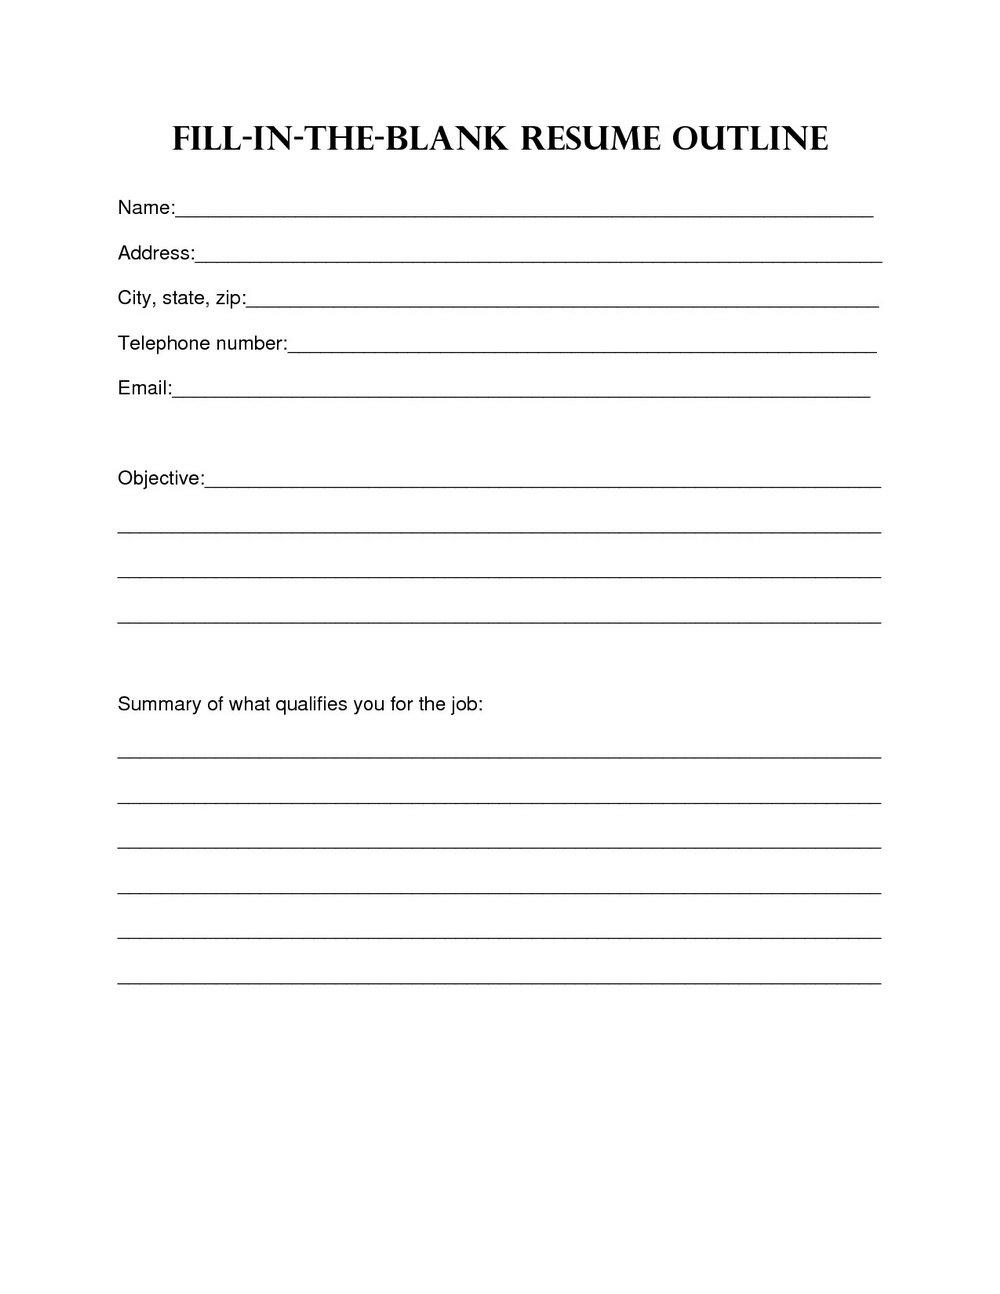 Blank Resume Template Pdf